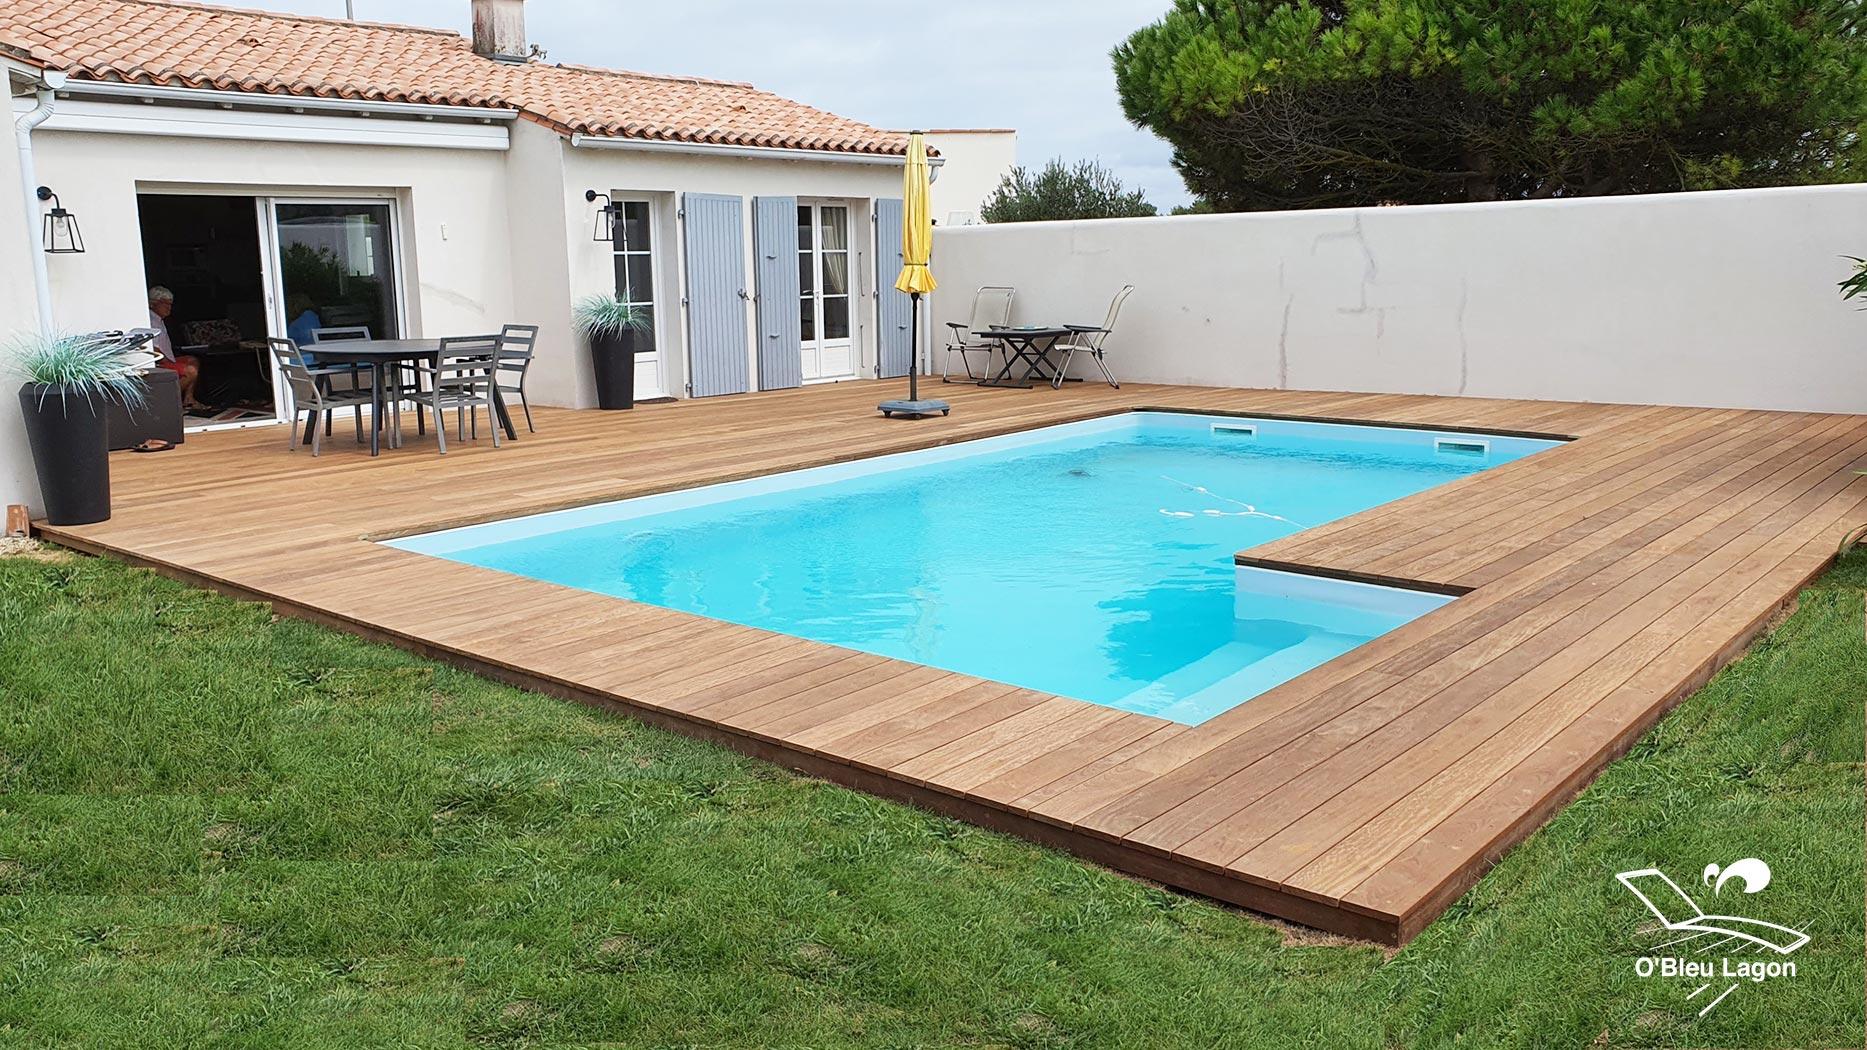 pose terrasse de piscine en bois exotique cumaru vendee